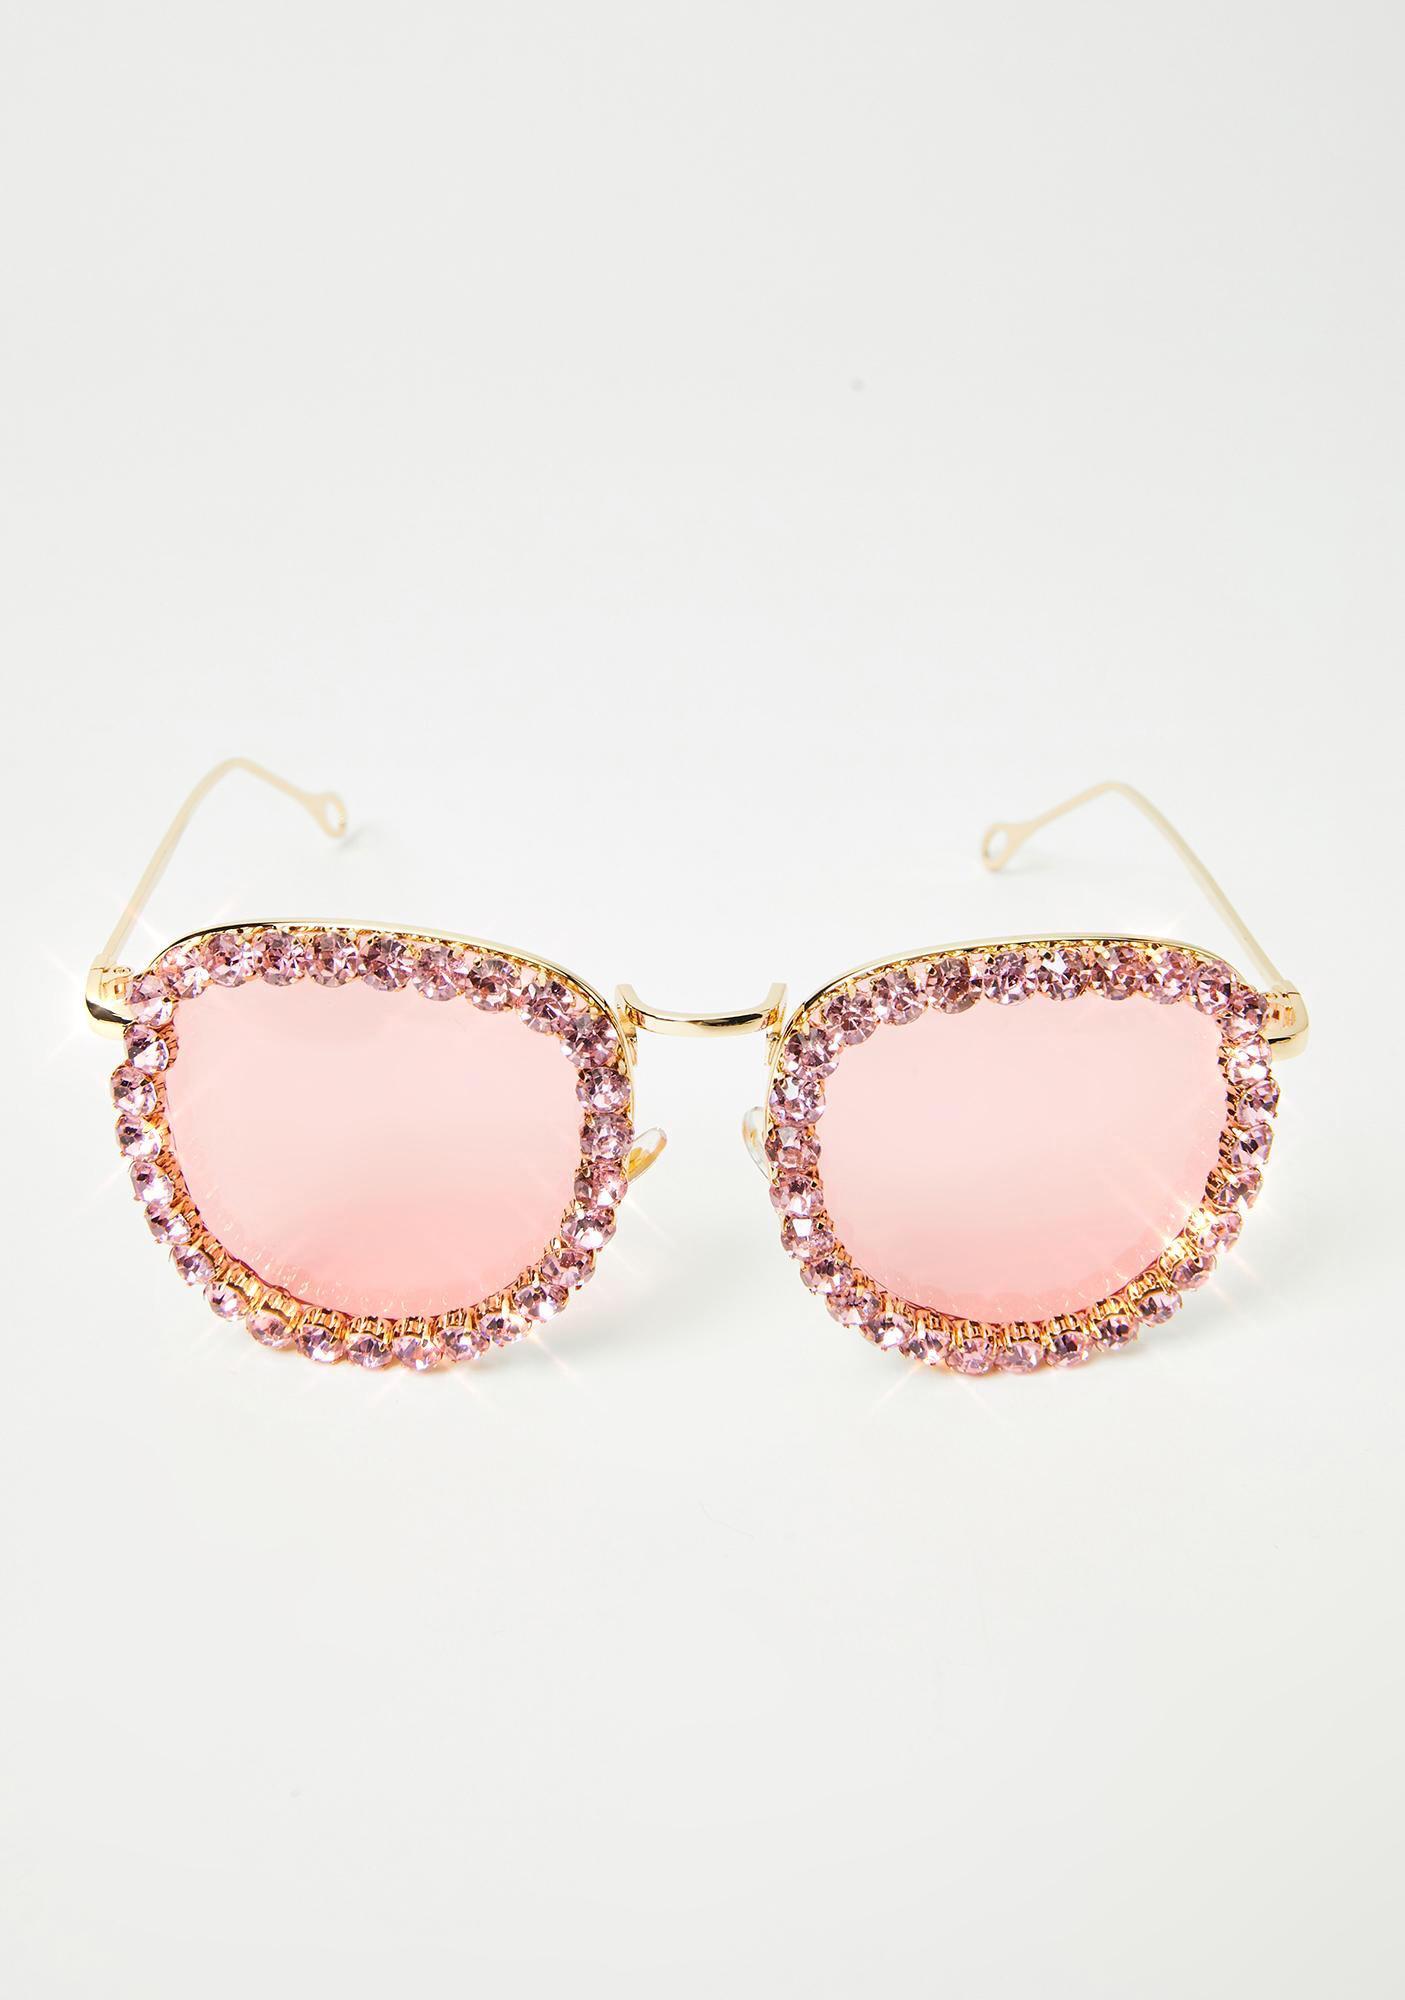 Glamour Patrol Rhinestone Sunglasses